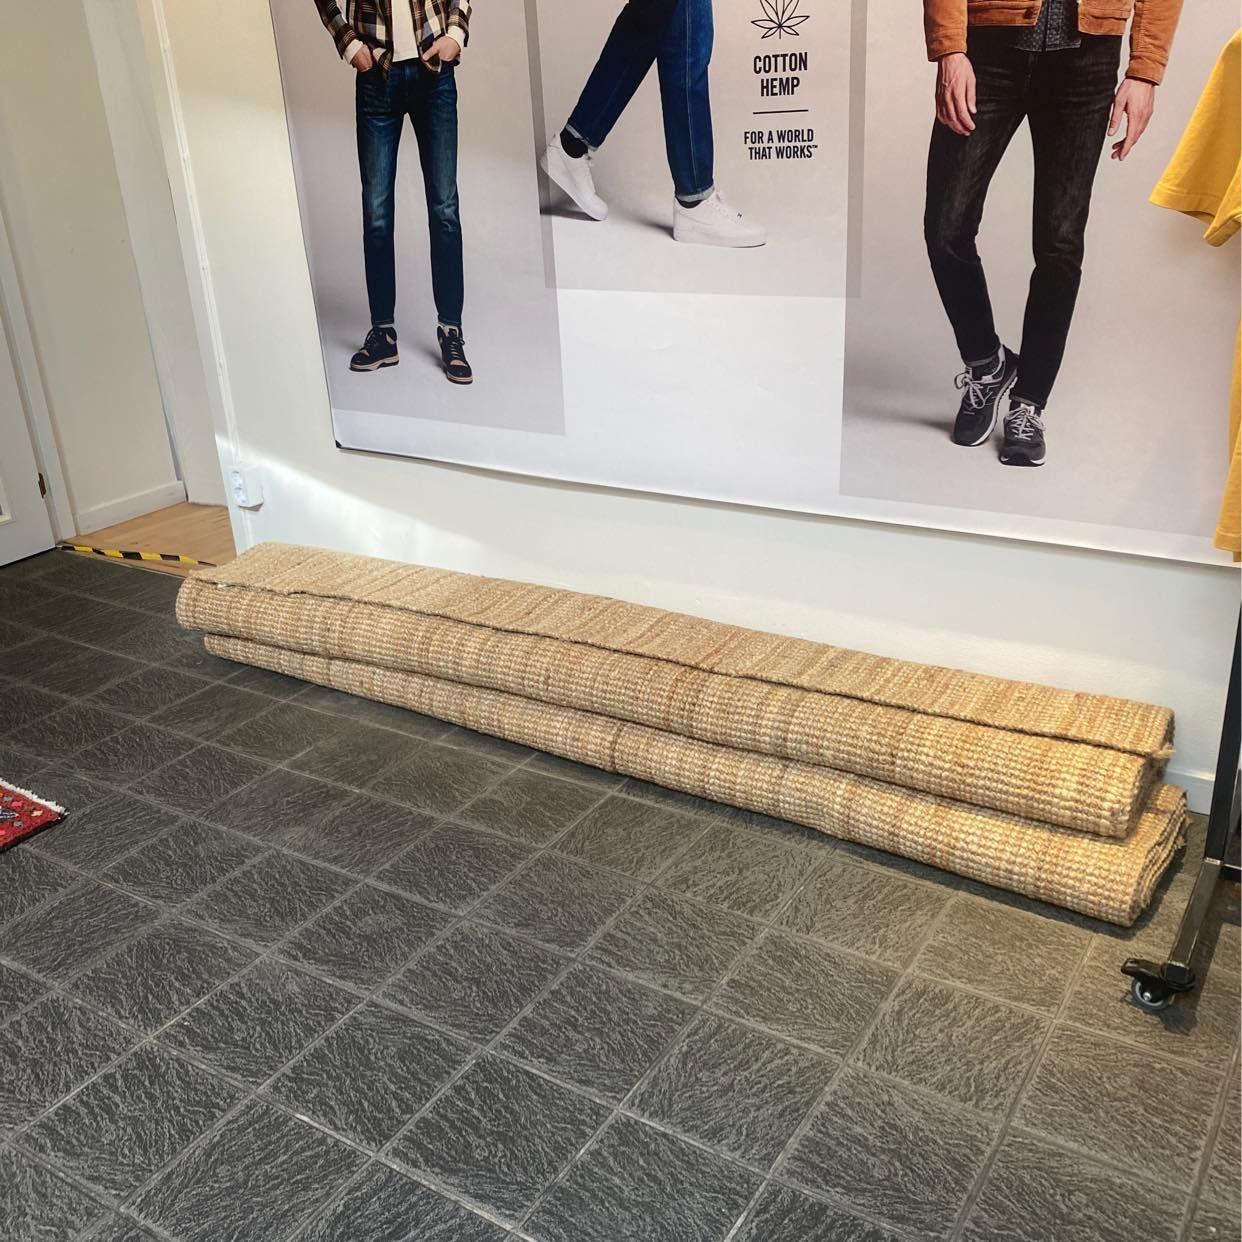 image of Slänga två mattor. - Stockholms Stad